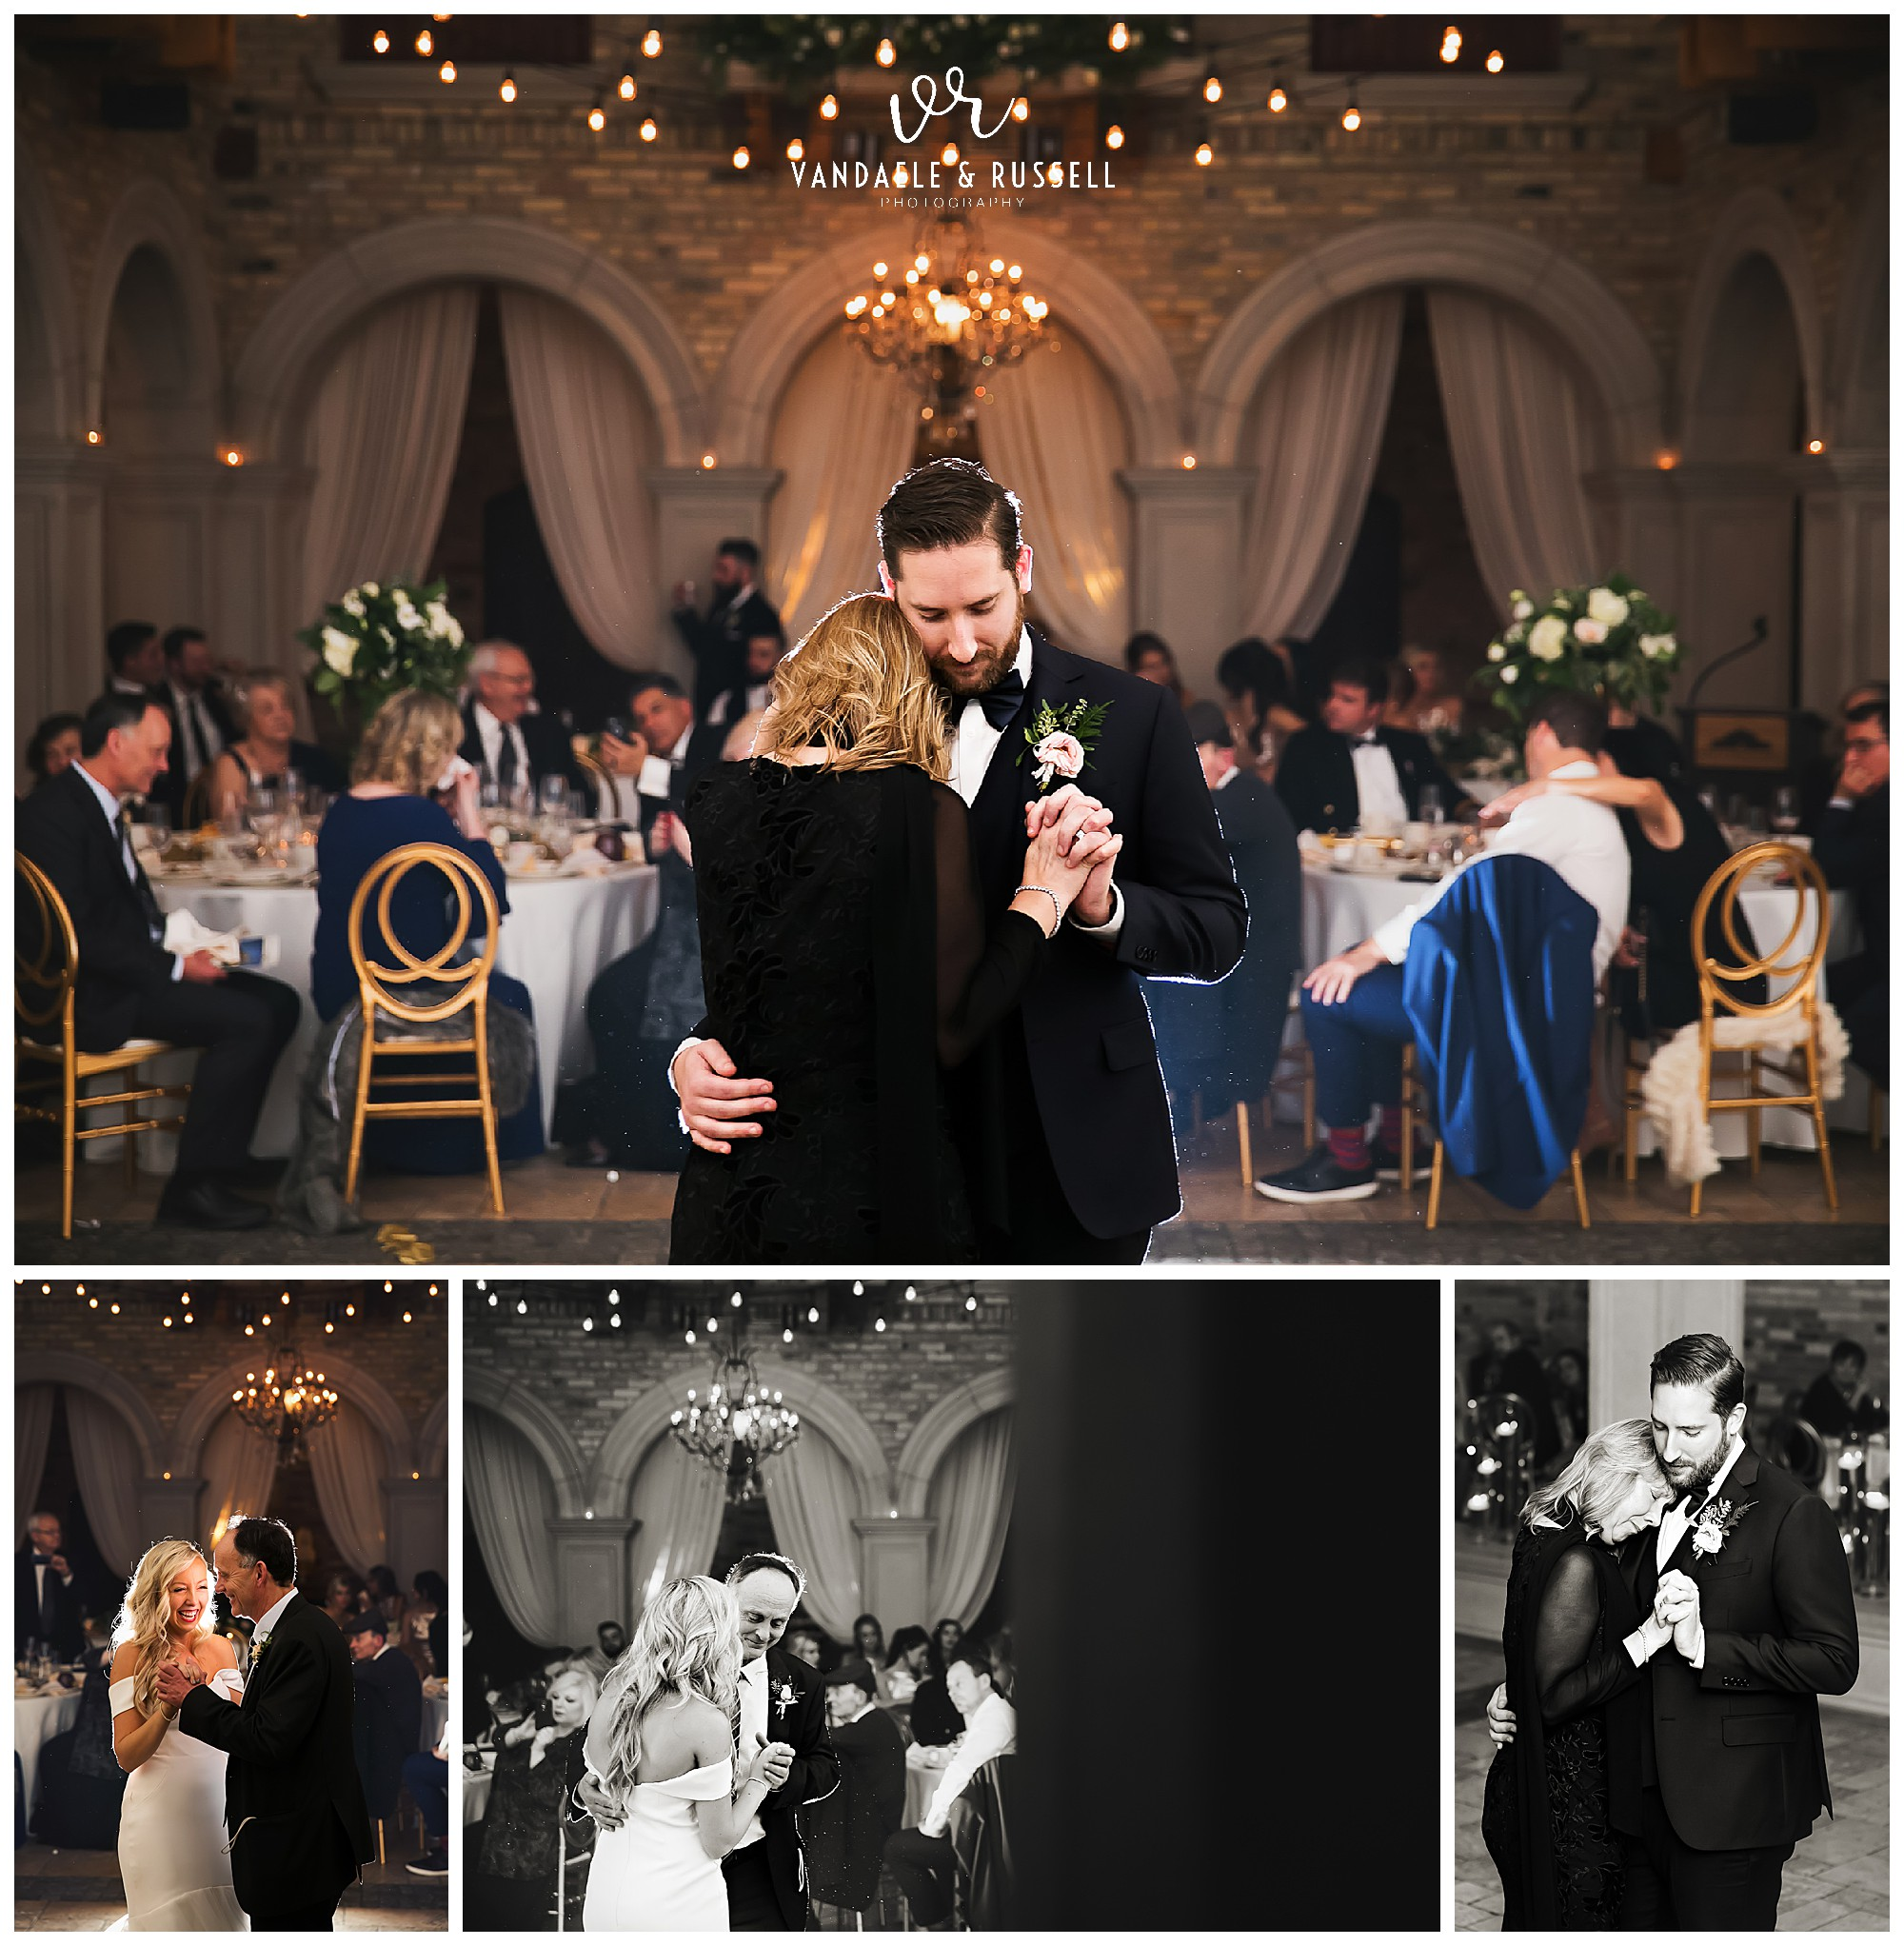 Hacienda-Sarria-Wedding-Photos-NYE-Michelle-Matt-VanDaele-Russell_0042.jpg